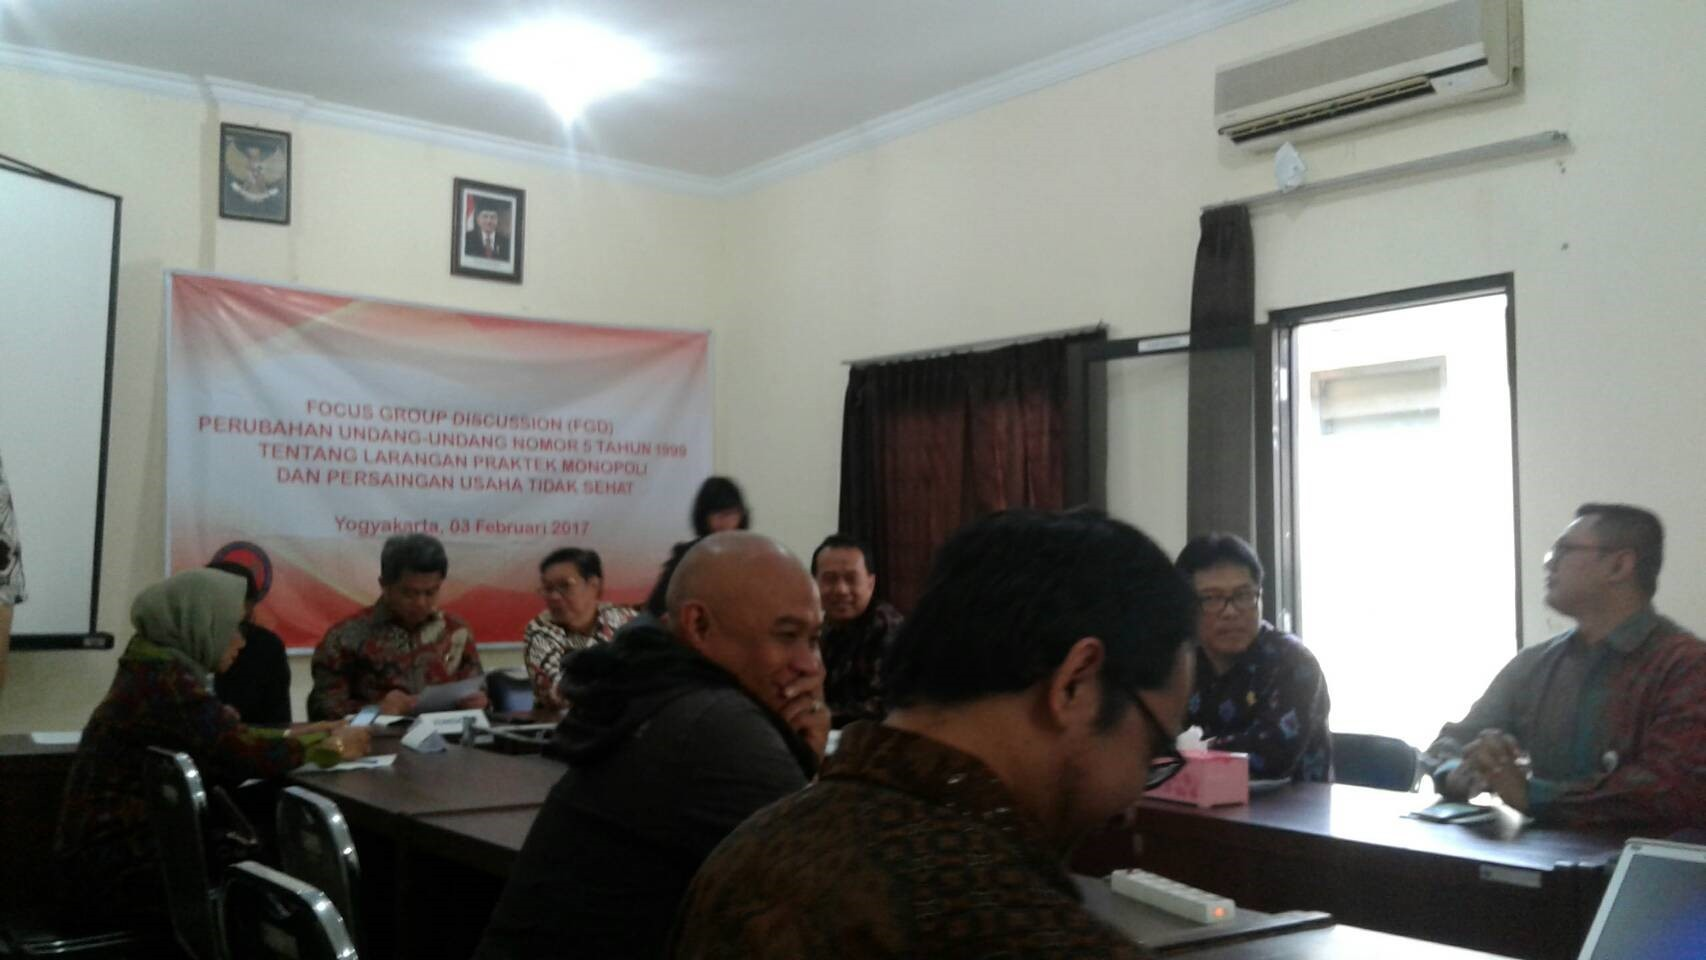 Forum Group Discussion Pusat Kajian Anti Korupsi : Perubahan UU Nomor 5 1999